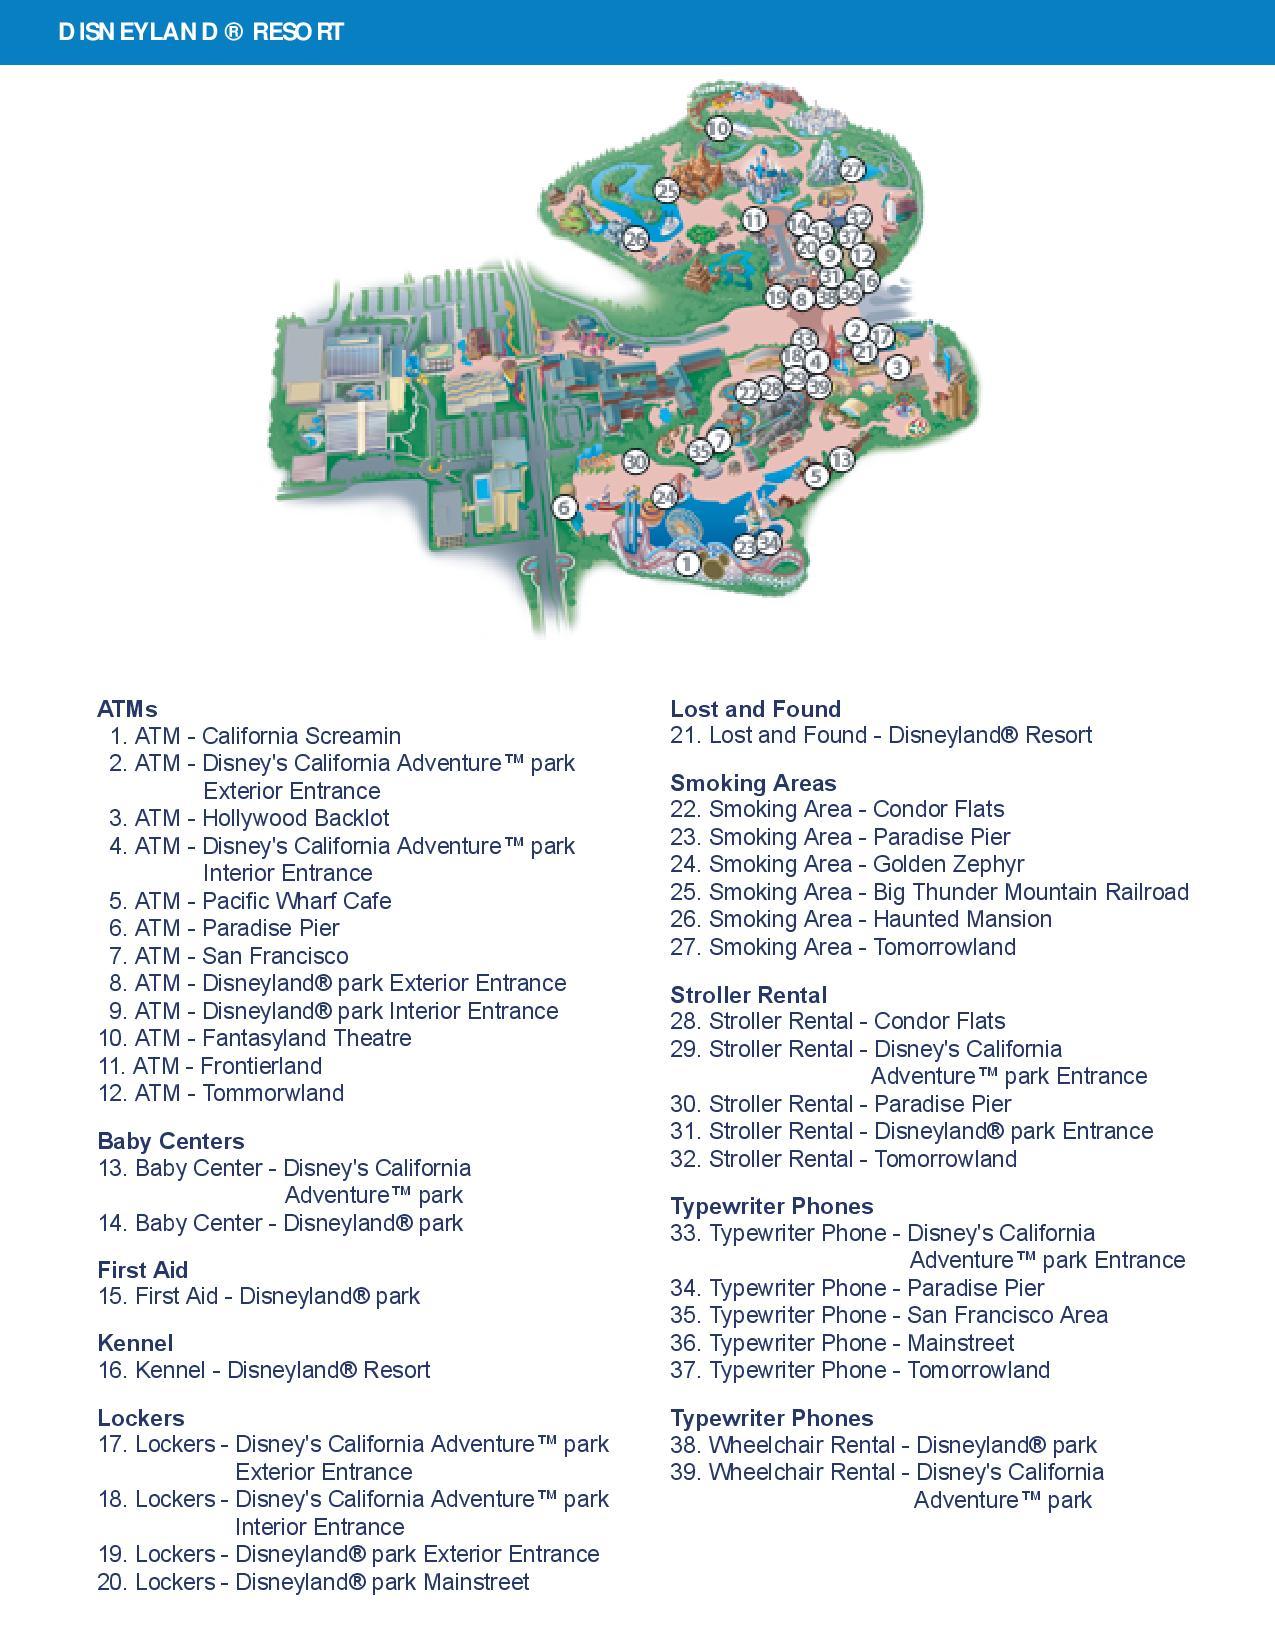 Disneyland Guest Services Map